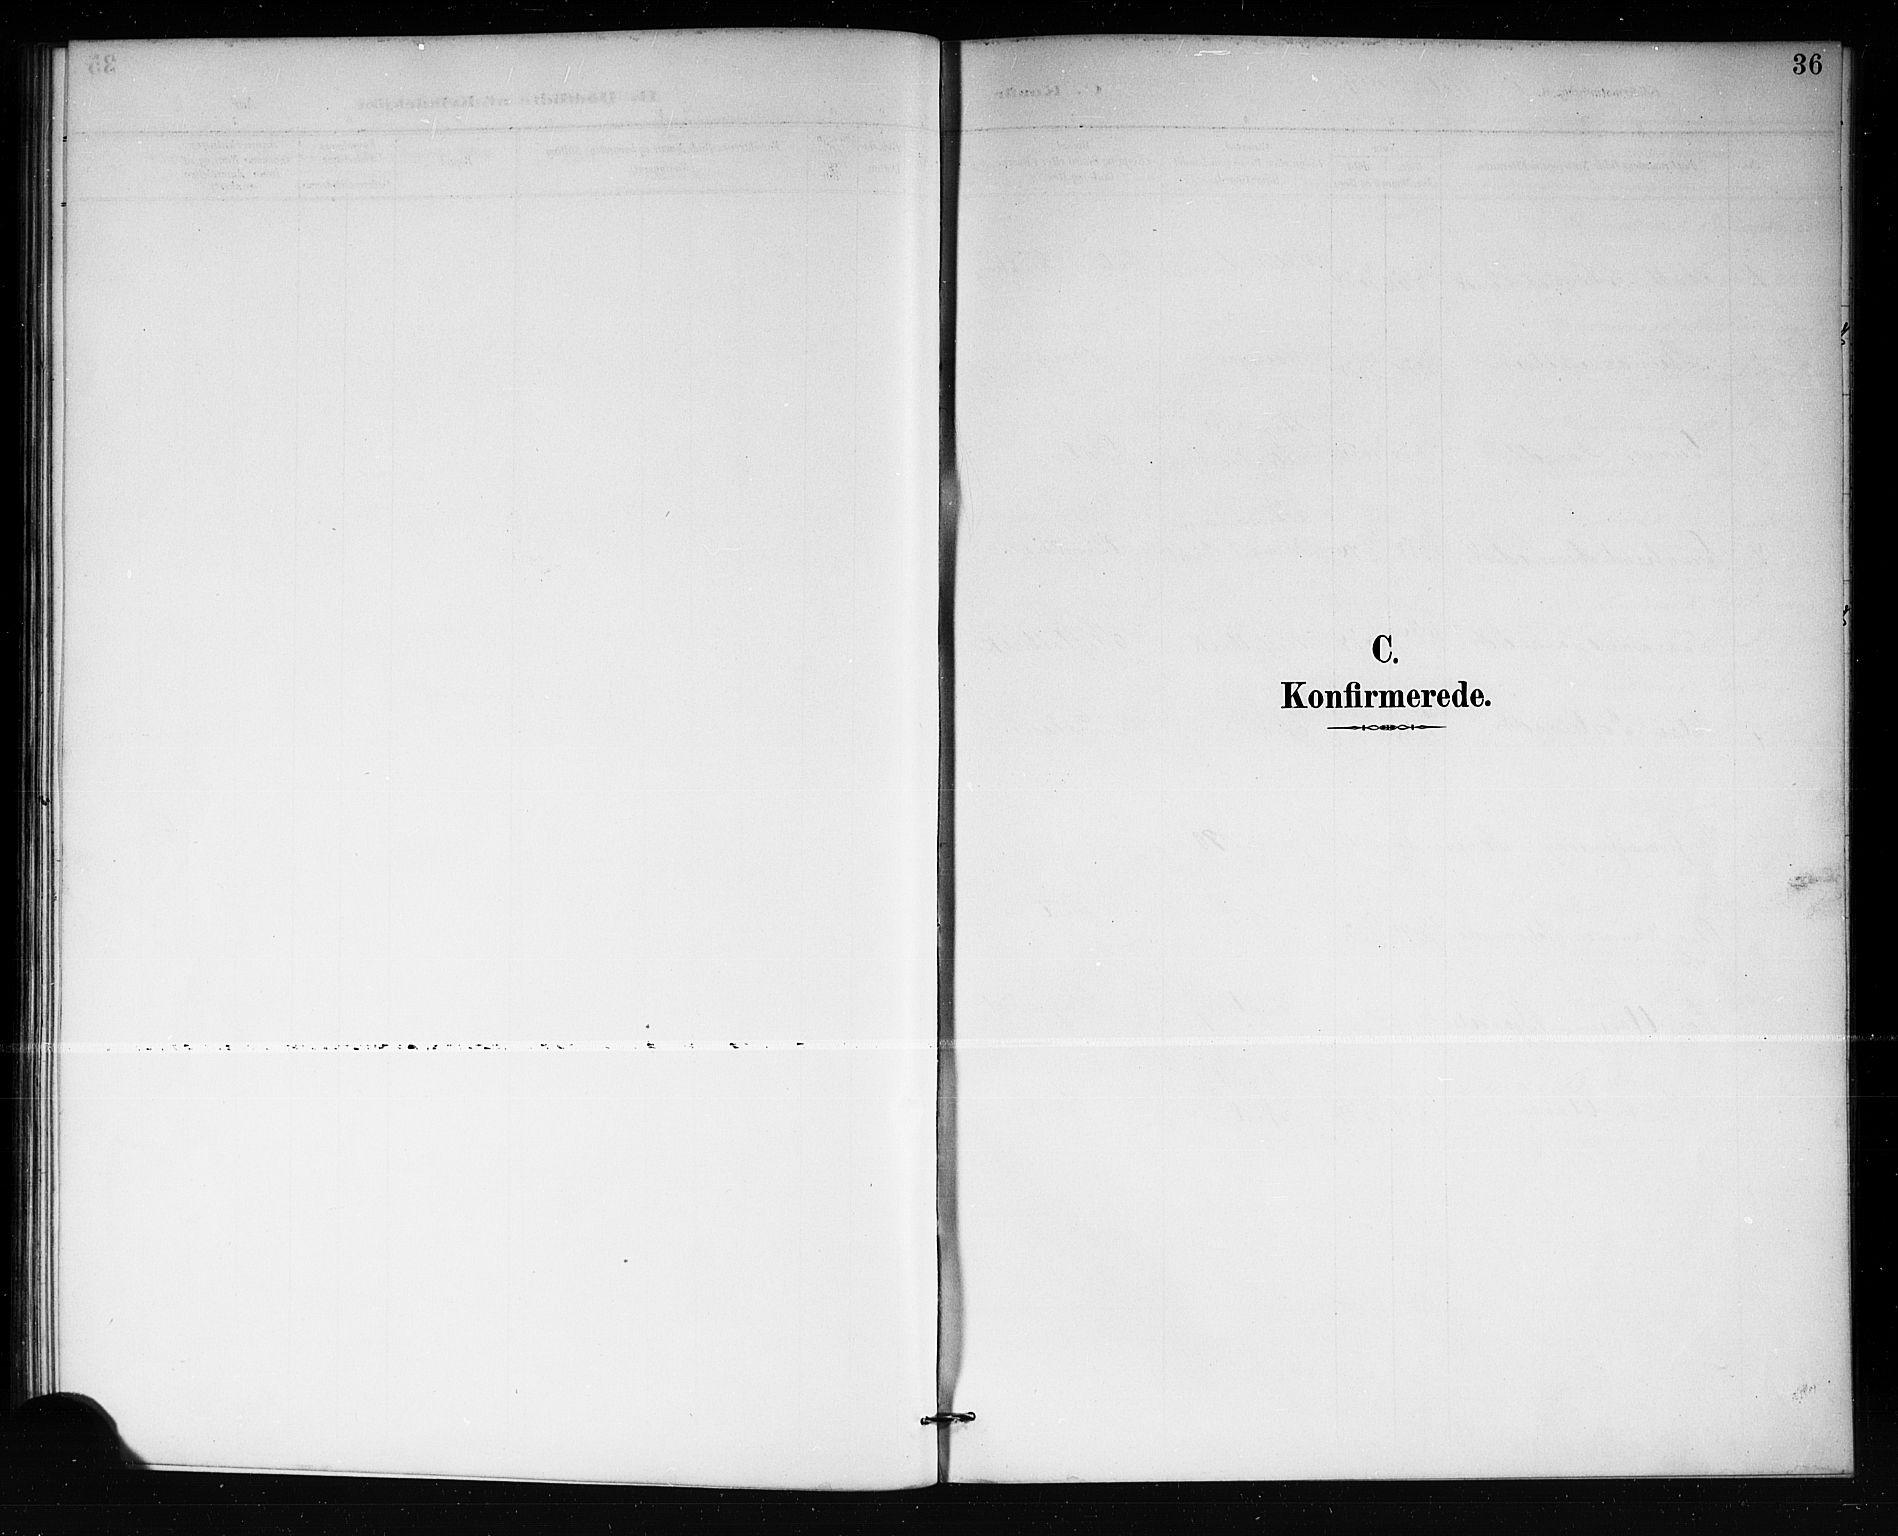 SAKO, Lårdal kirkebøker, G/Gb/L0003: Klokkerbok nr. II 3, 1889-1920, s. 36